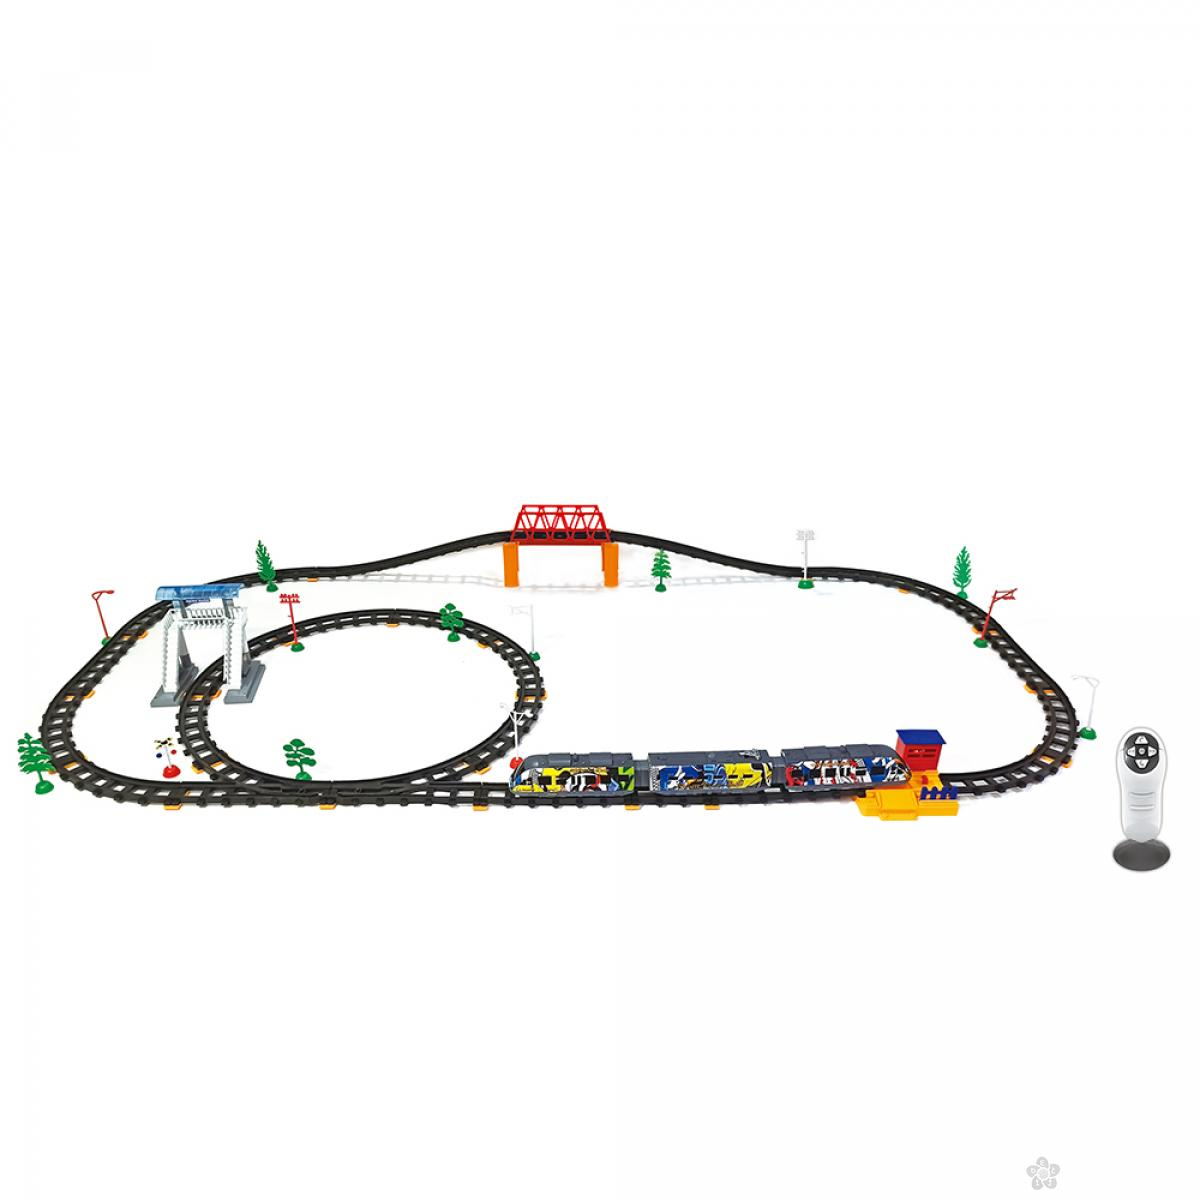 RC Voz, železnicka stanica i mostovi 99 Elementa 23053